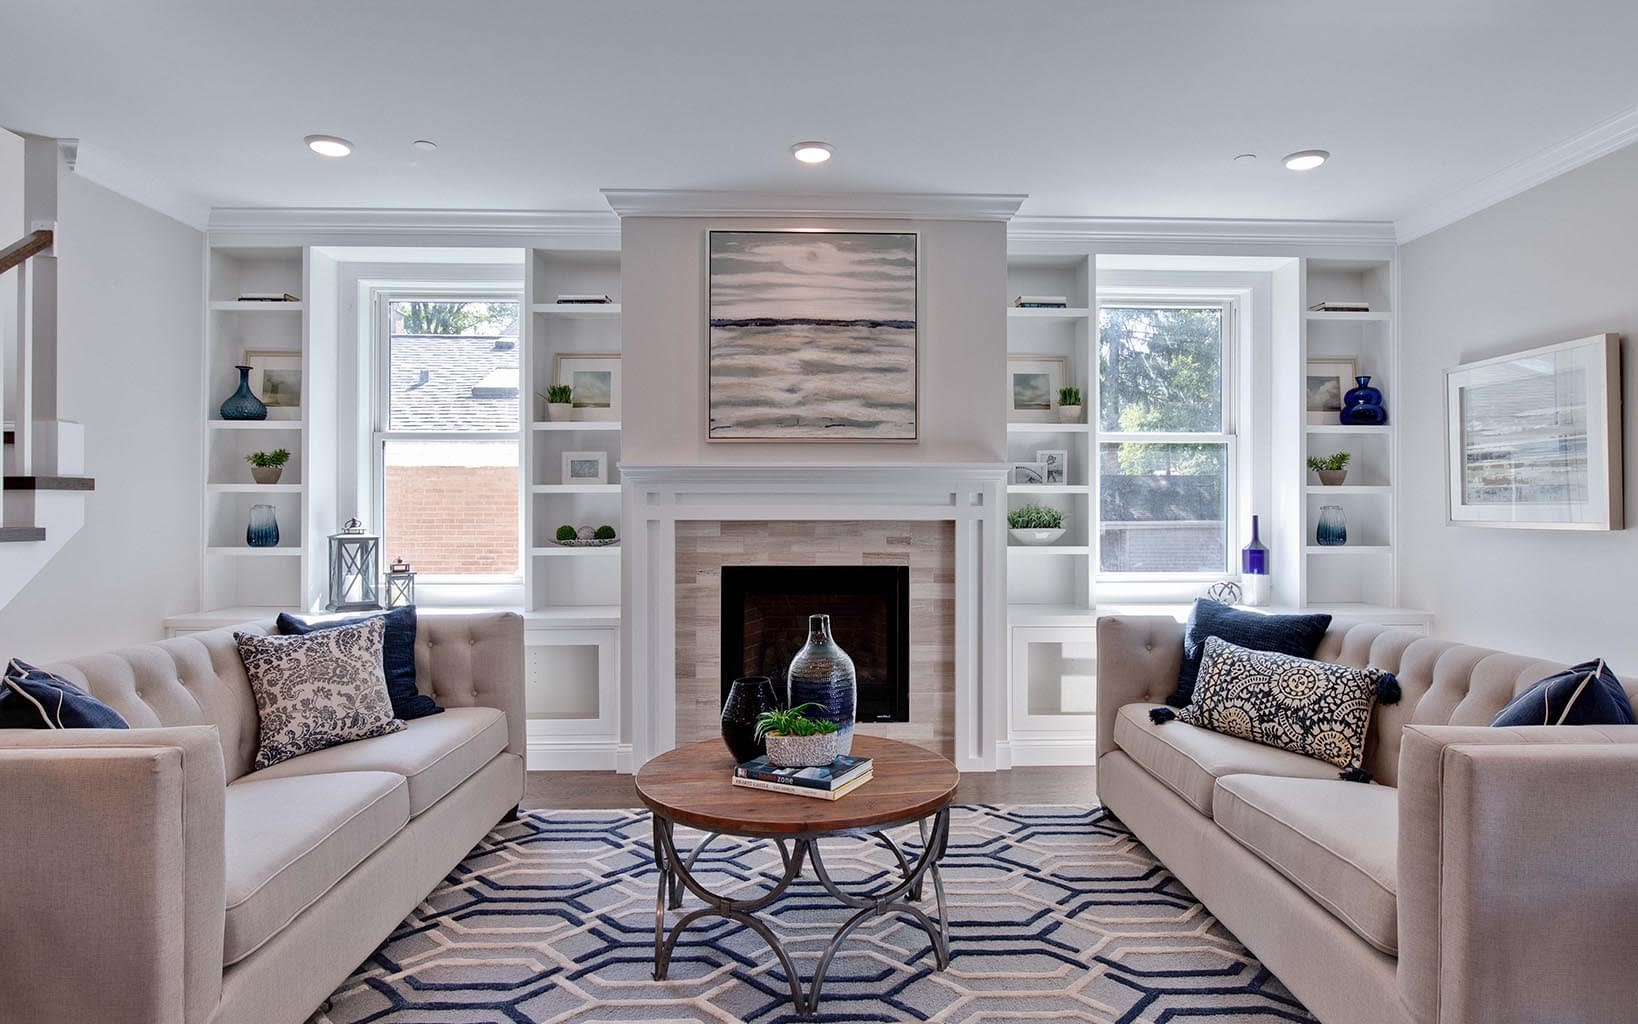 Modern Living Room   Chicago Custom Home Builder - BrightLeaf Homes   BrightLeafHomes.com